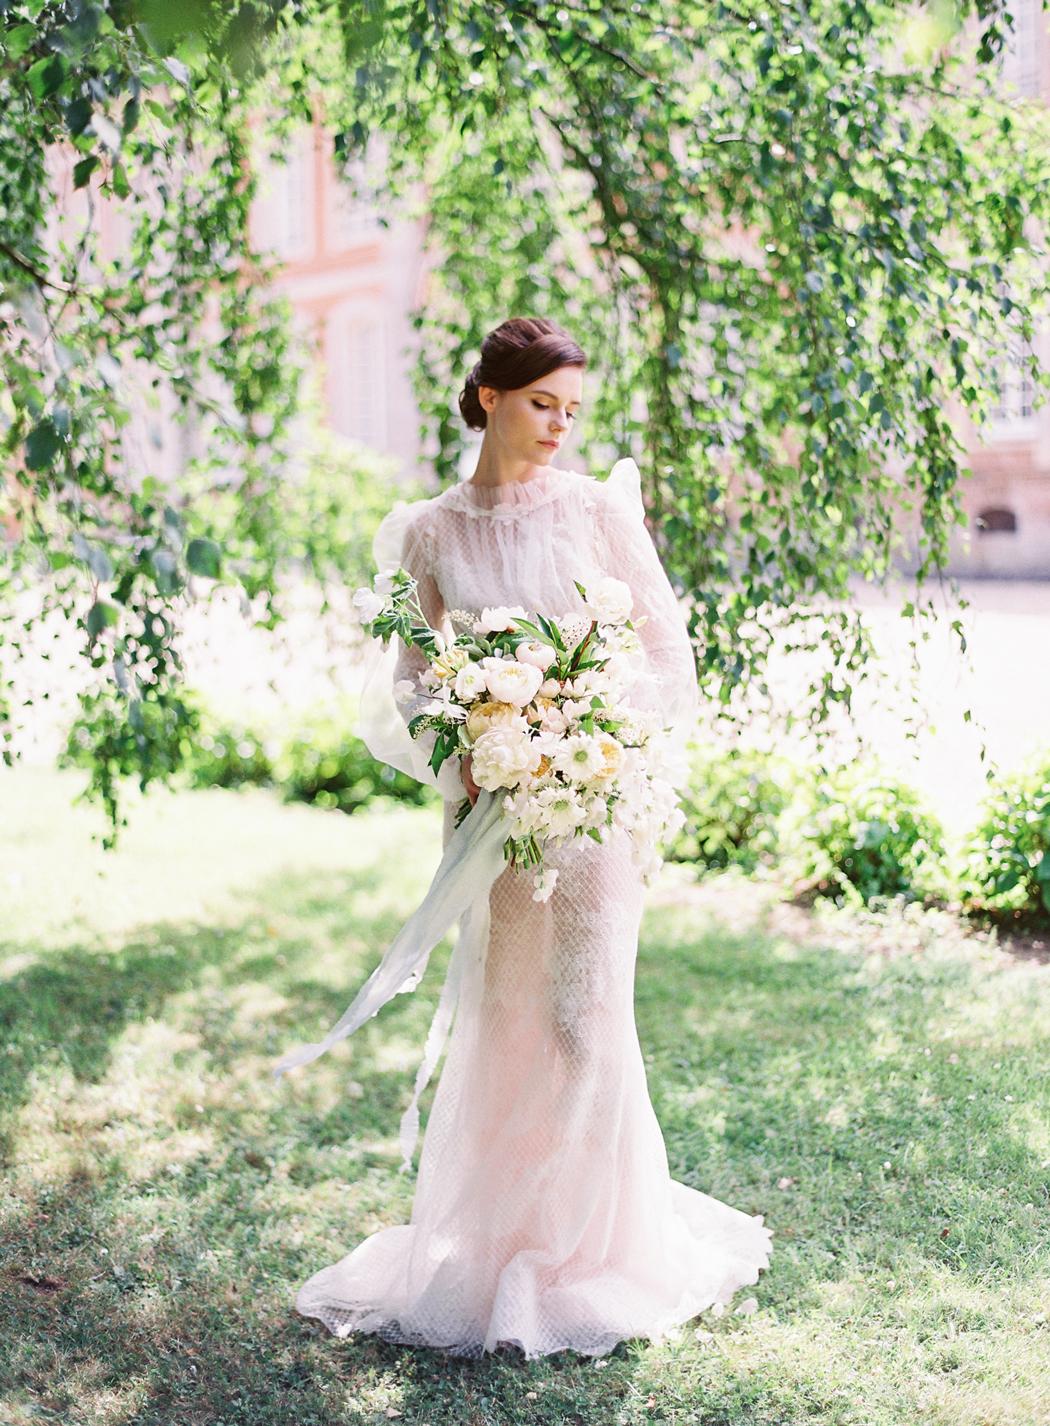 bride wearing high neck wedding dress